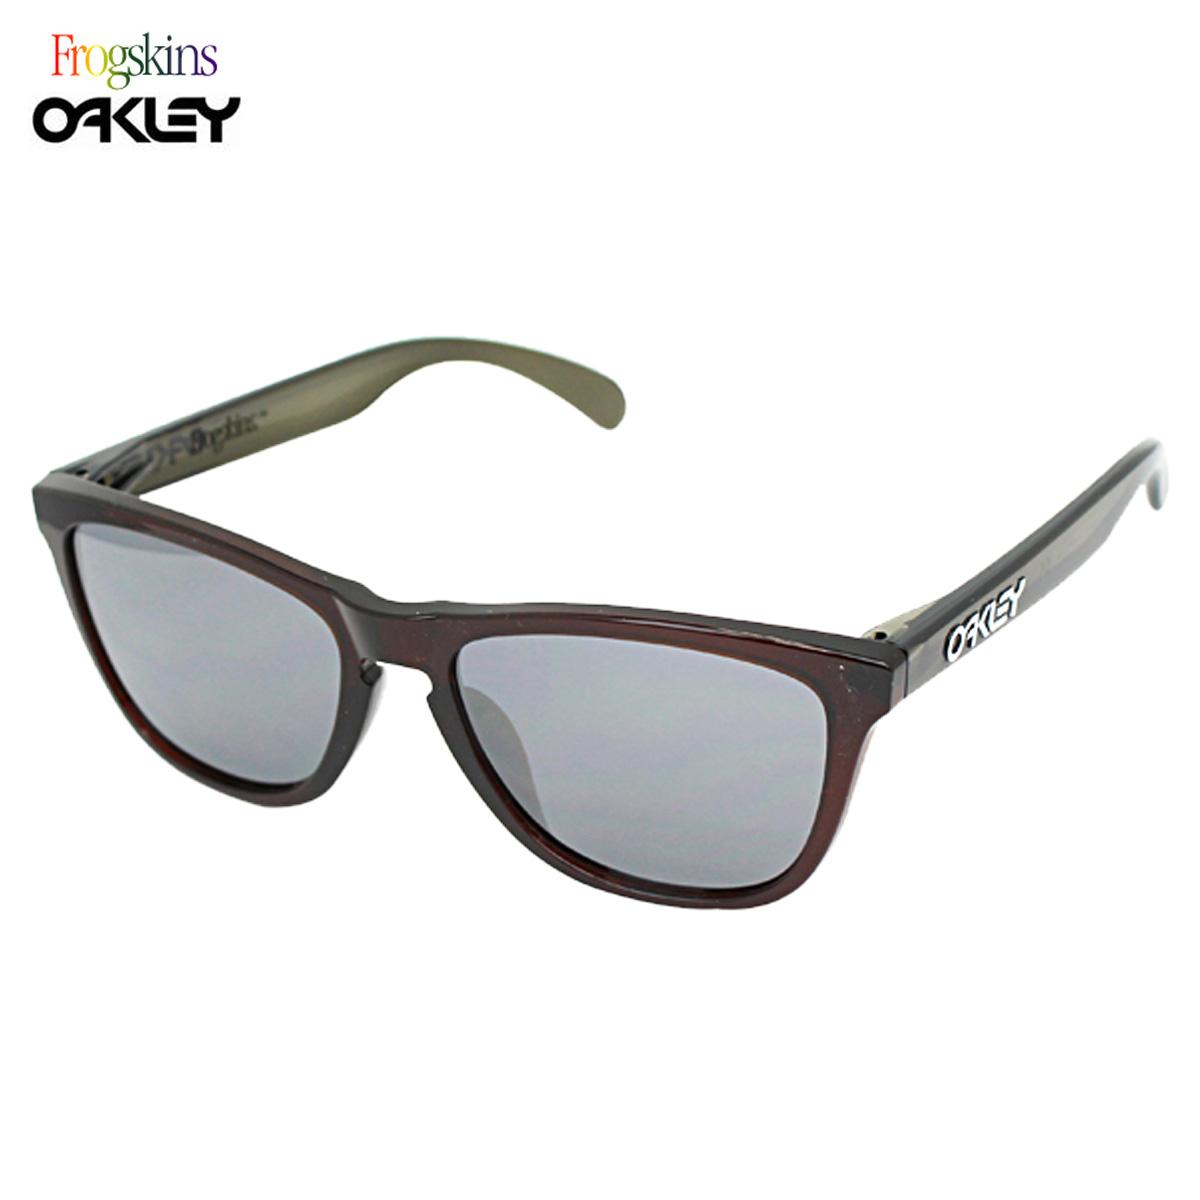 91902974c1e5 ... ireland allsports oakley oakley sunglasses frogskins asian fit frog  skin mens womens glasses fit asian oo9245